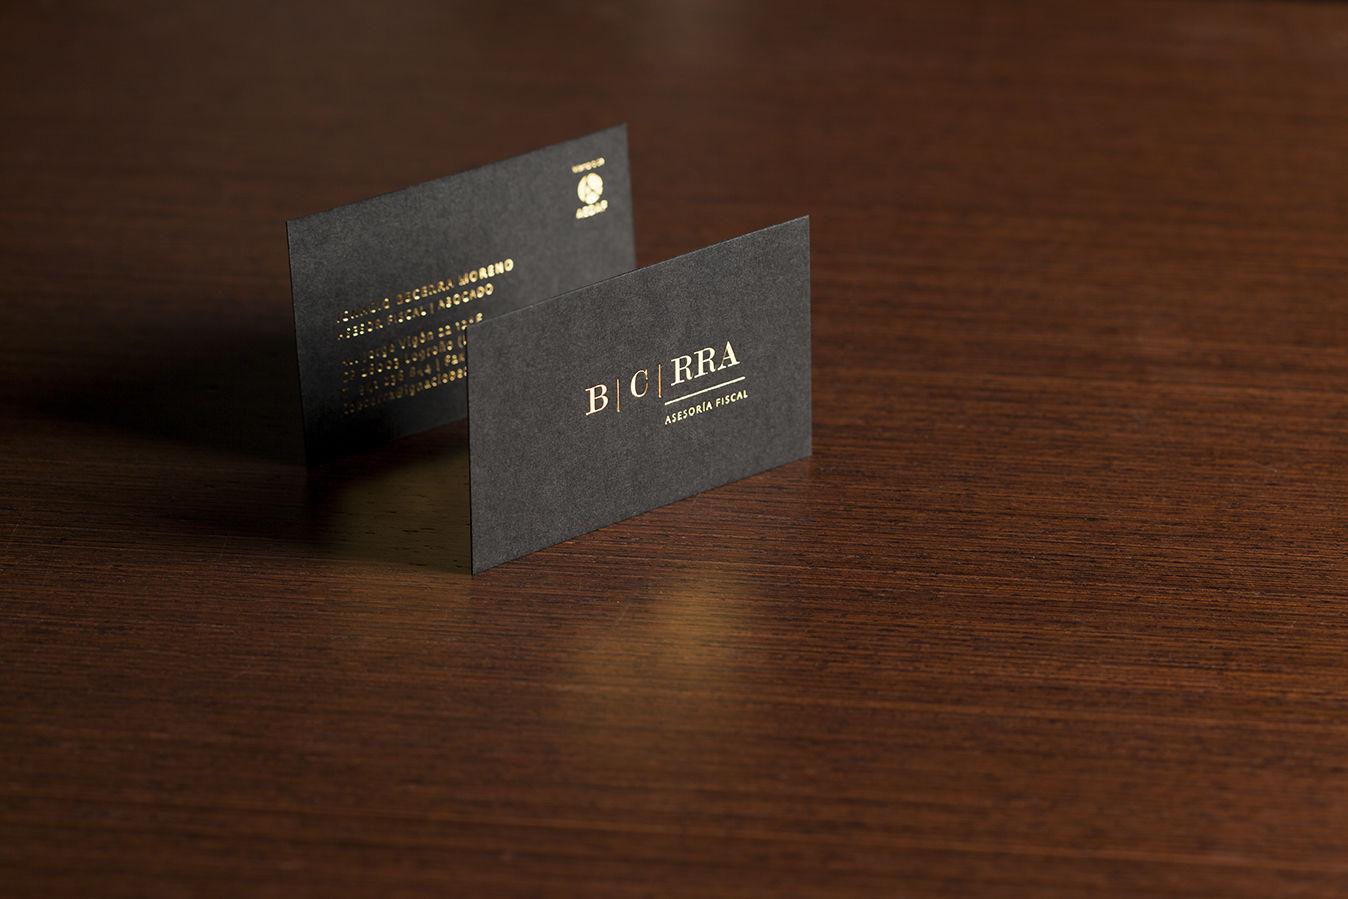 diseño-grafico-logroño-logotipo-tarjeta-becerra